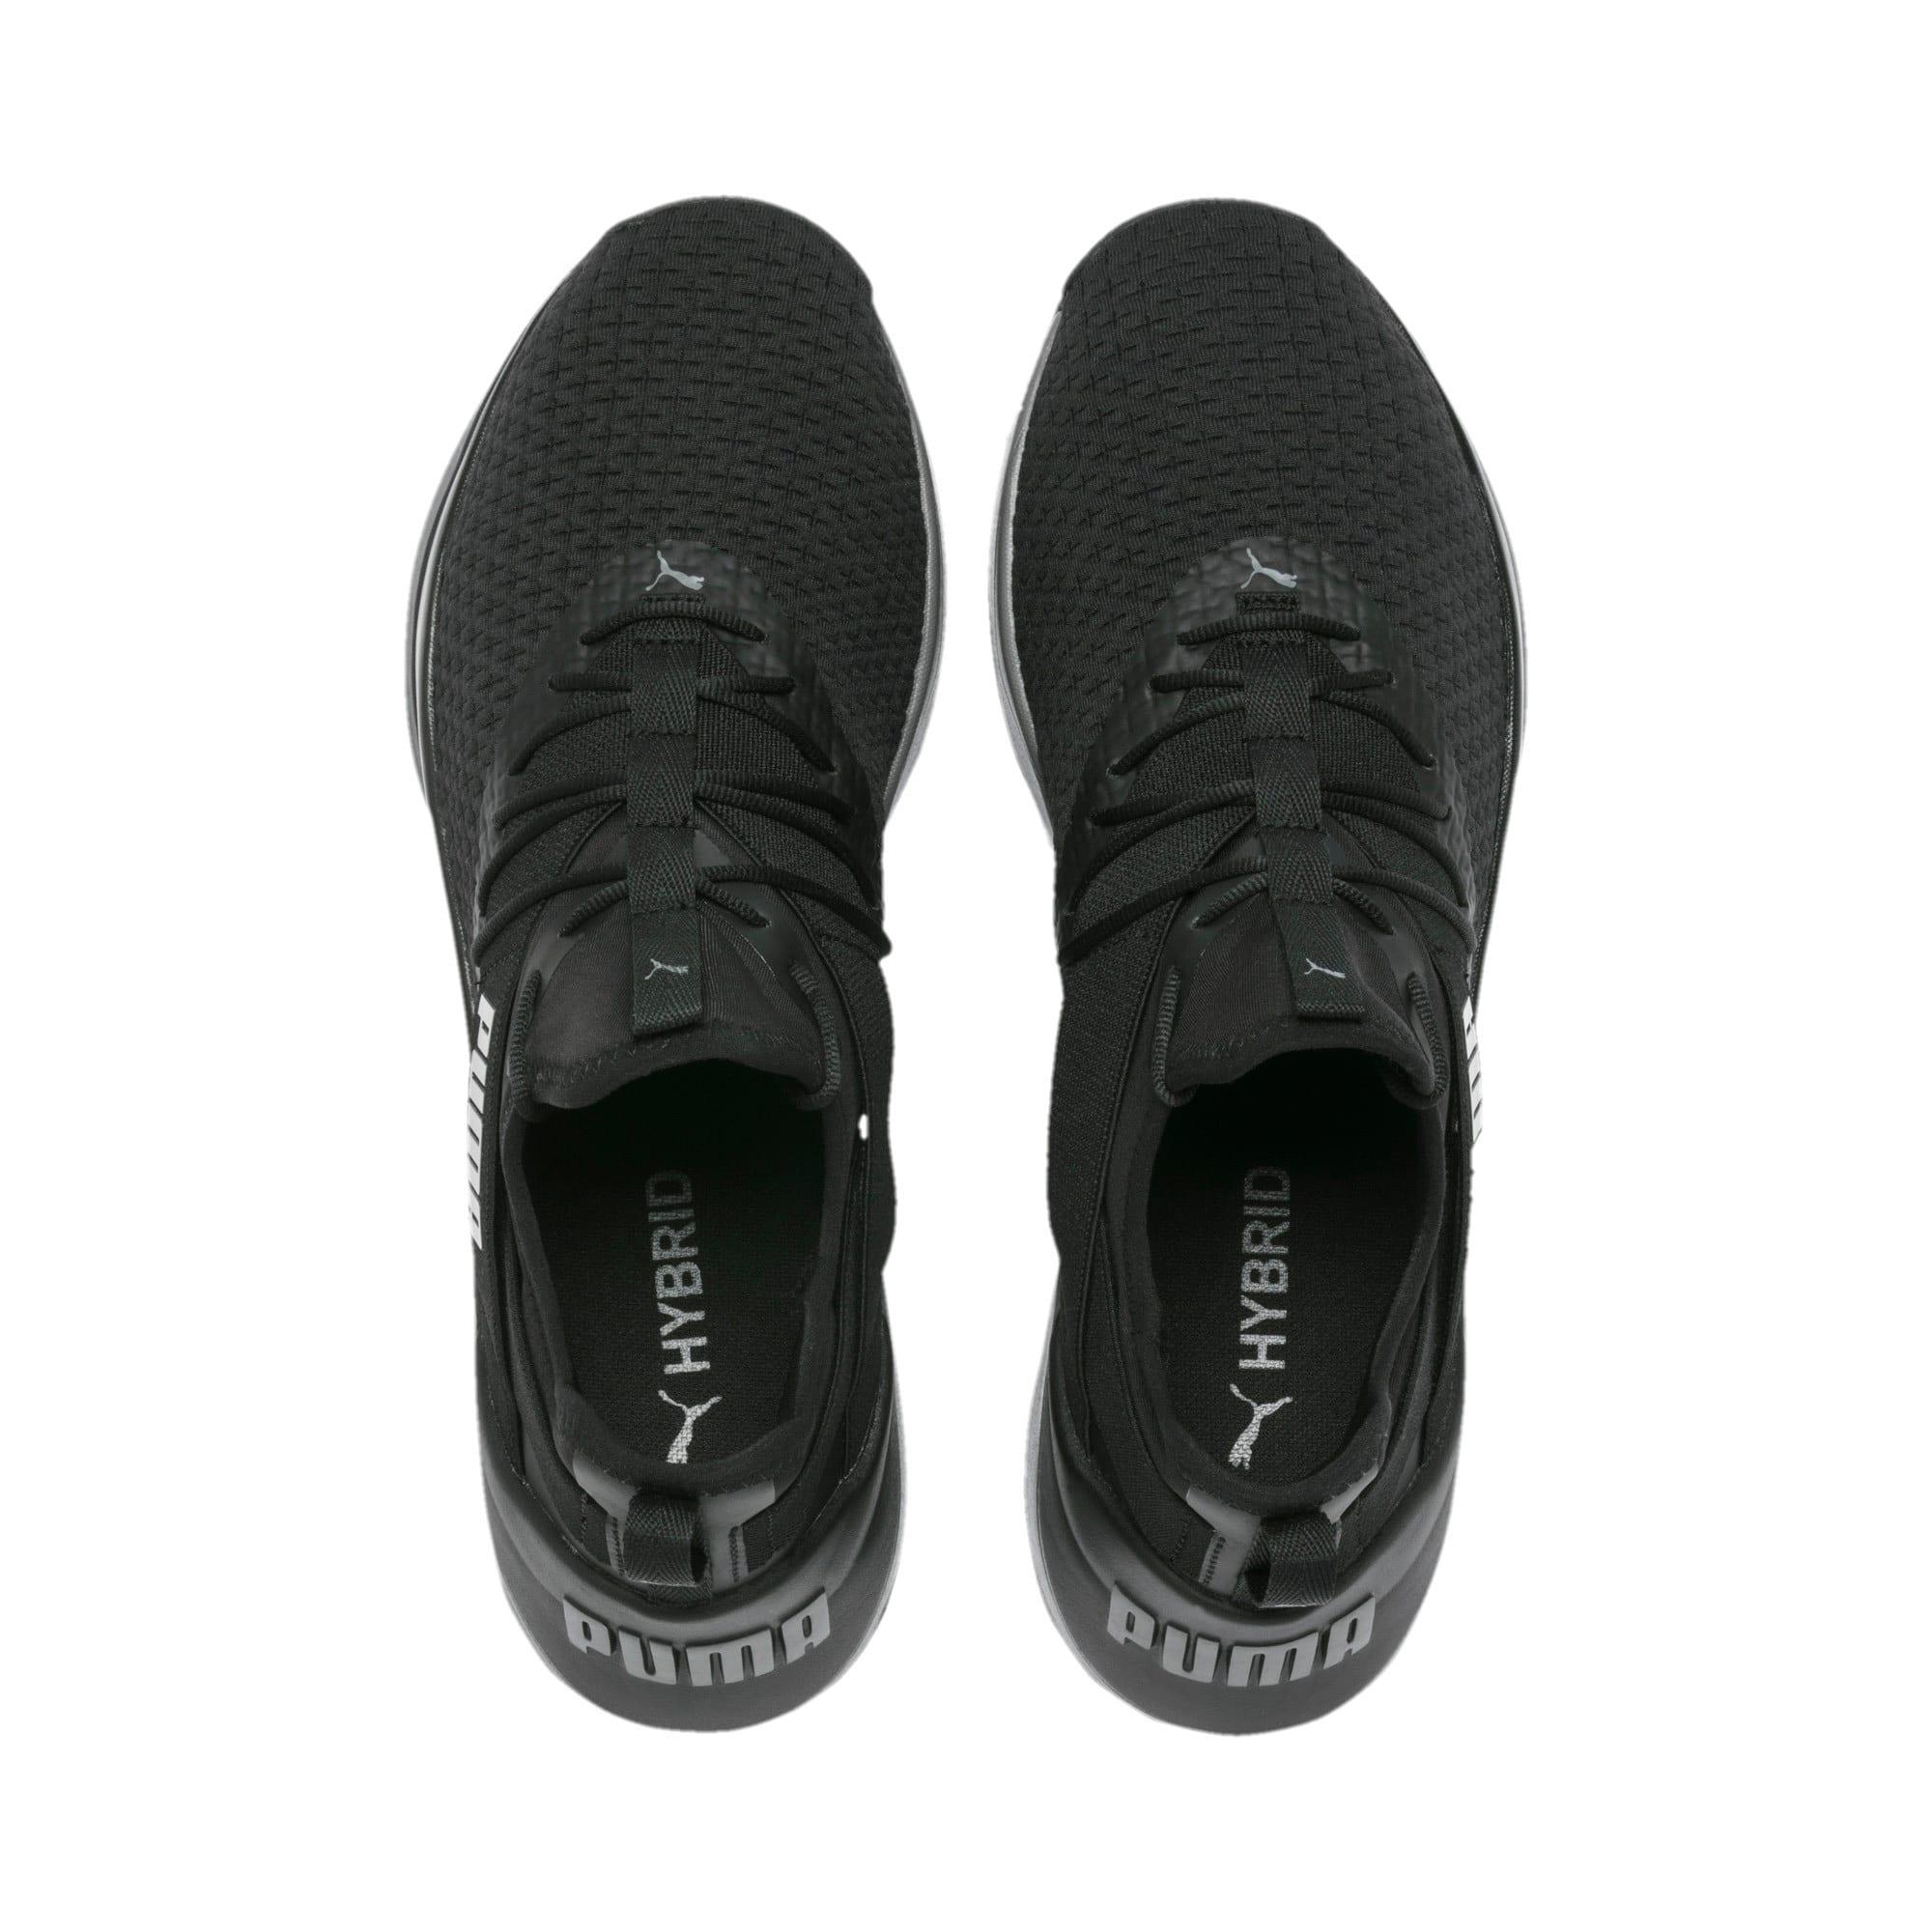 Thumbnail 8 van Jaab XT sneakers voor mannen, Puma Black-CASTLEROCK, medium